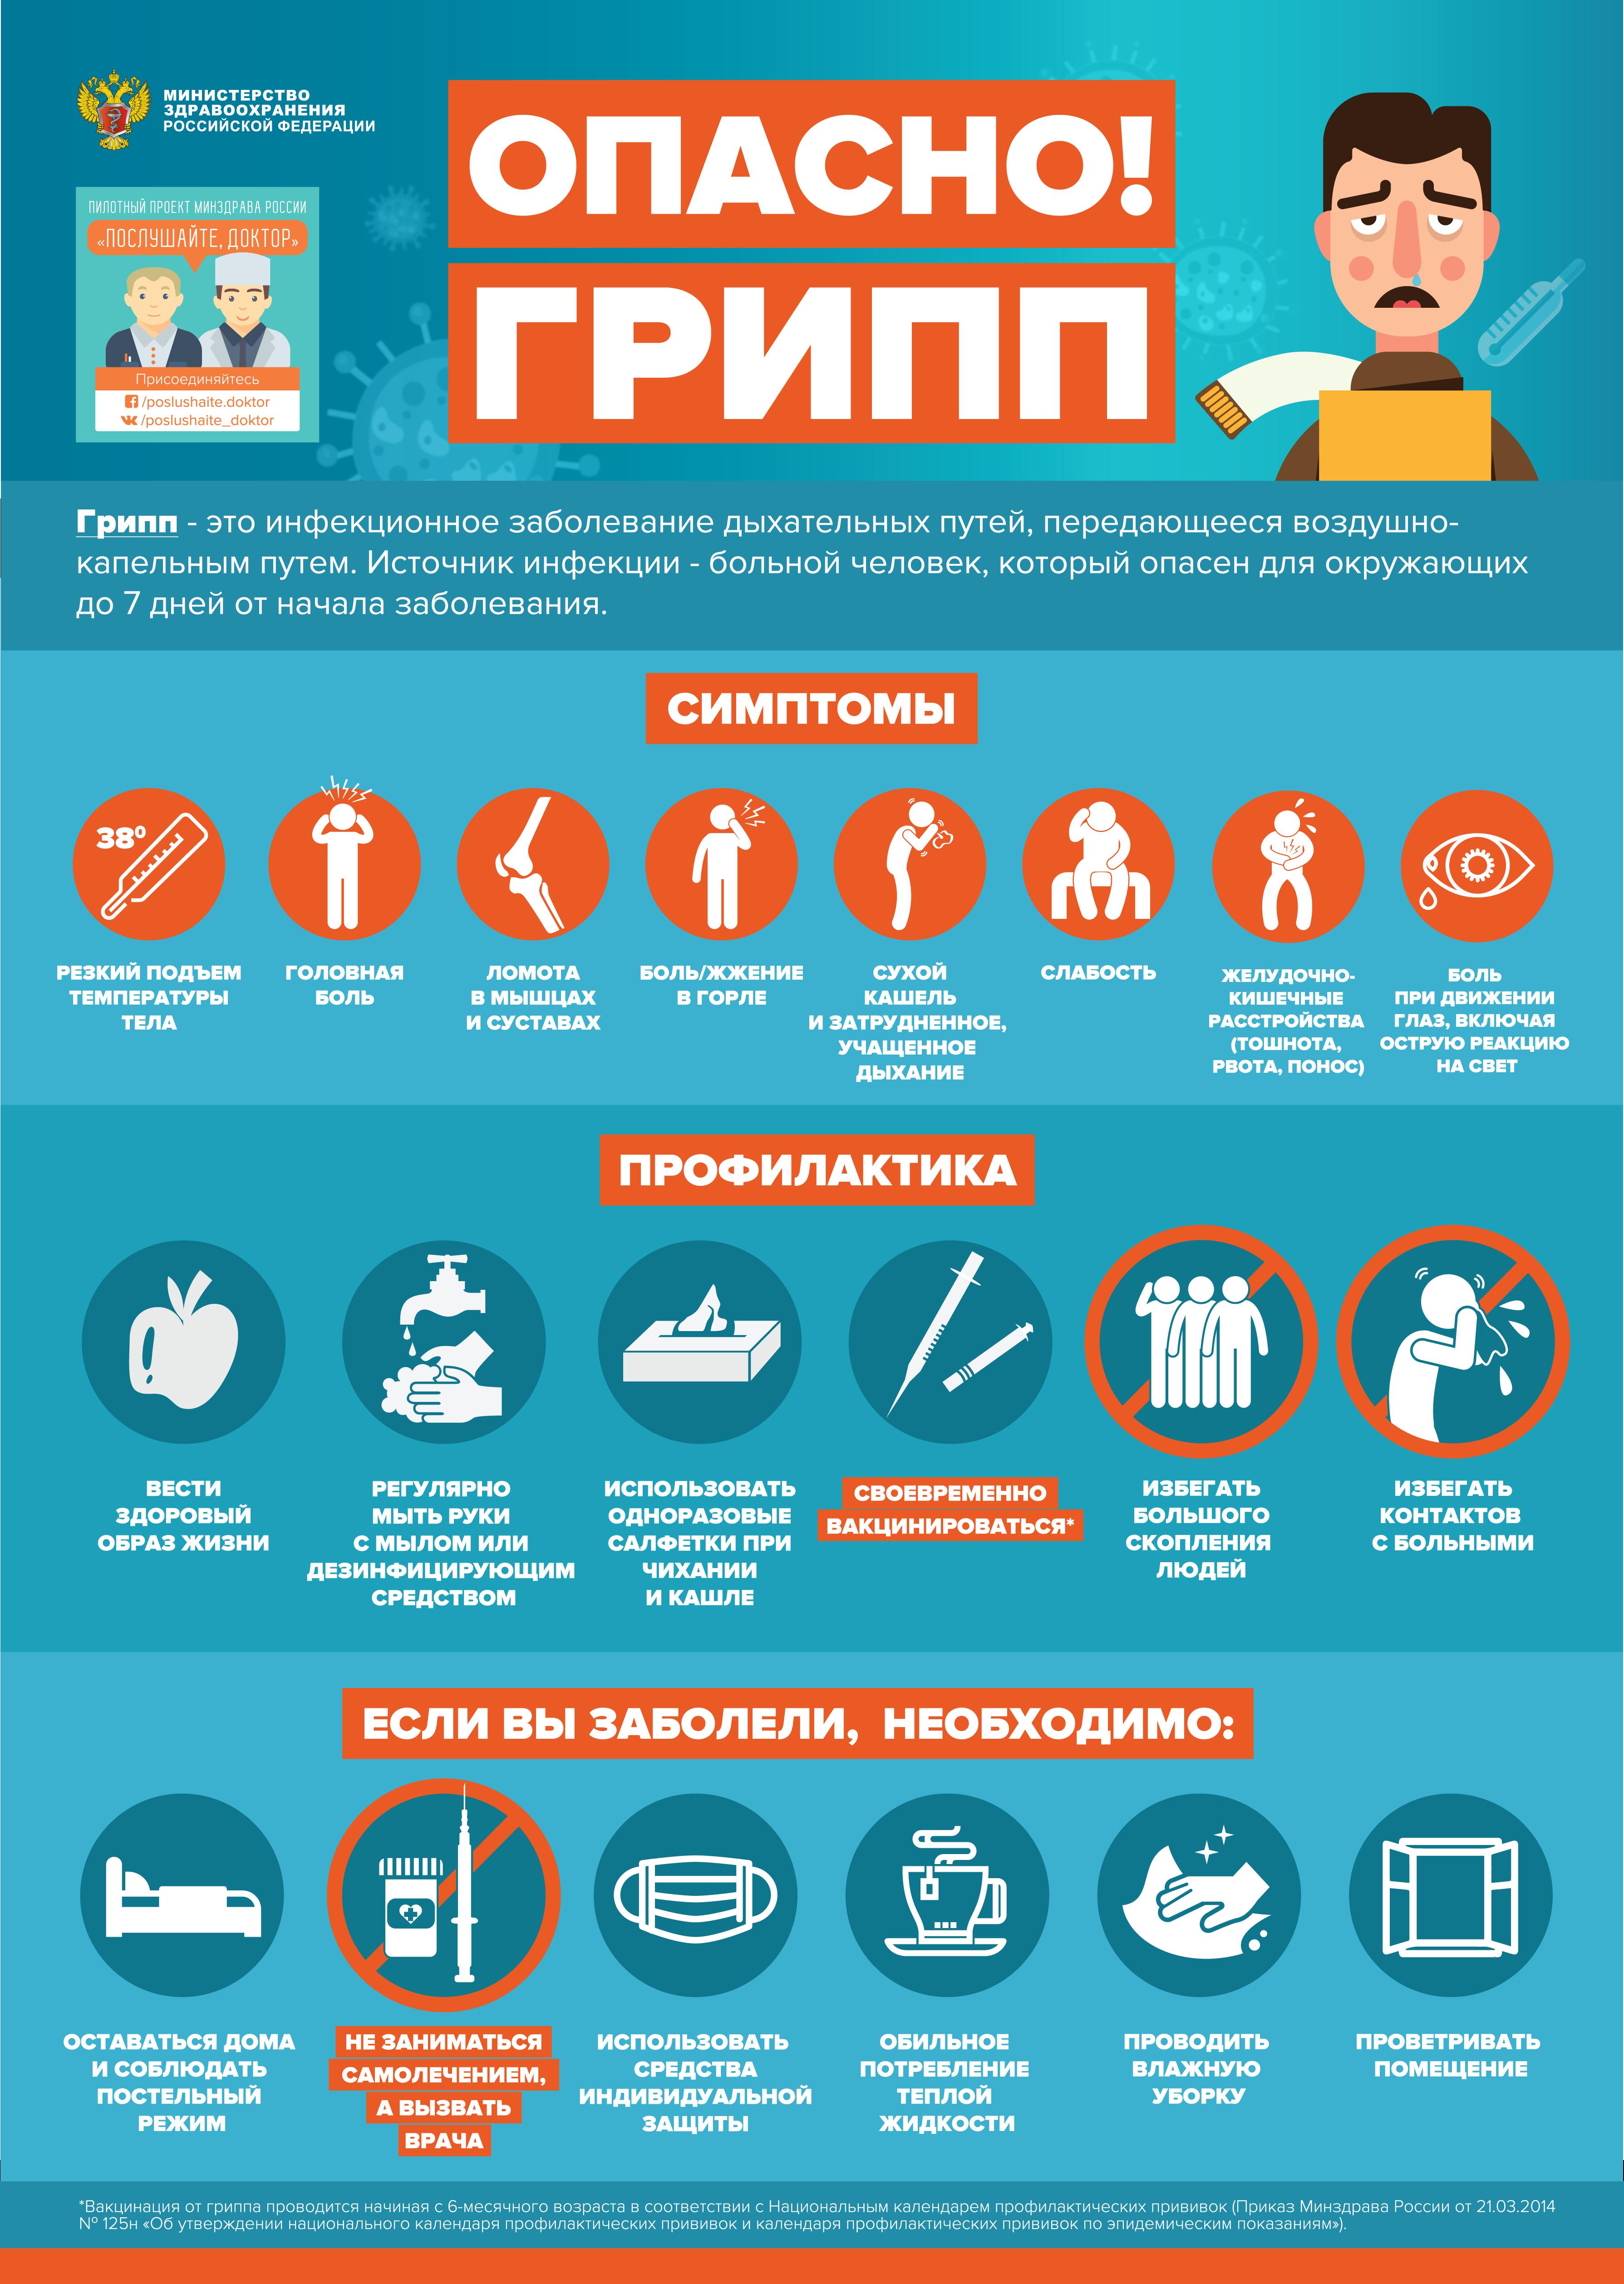 votknul-huy-do-samih-kishkov-zasveti-sportsmenov-russkie